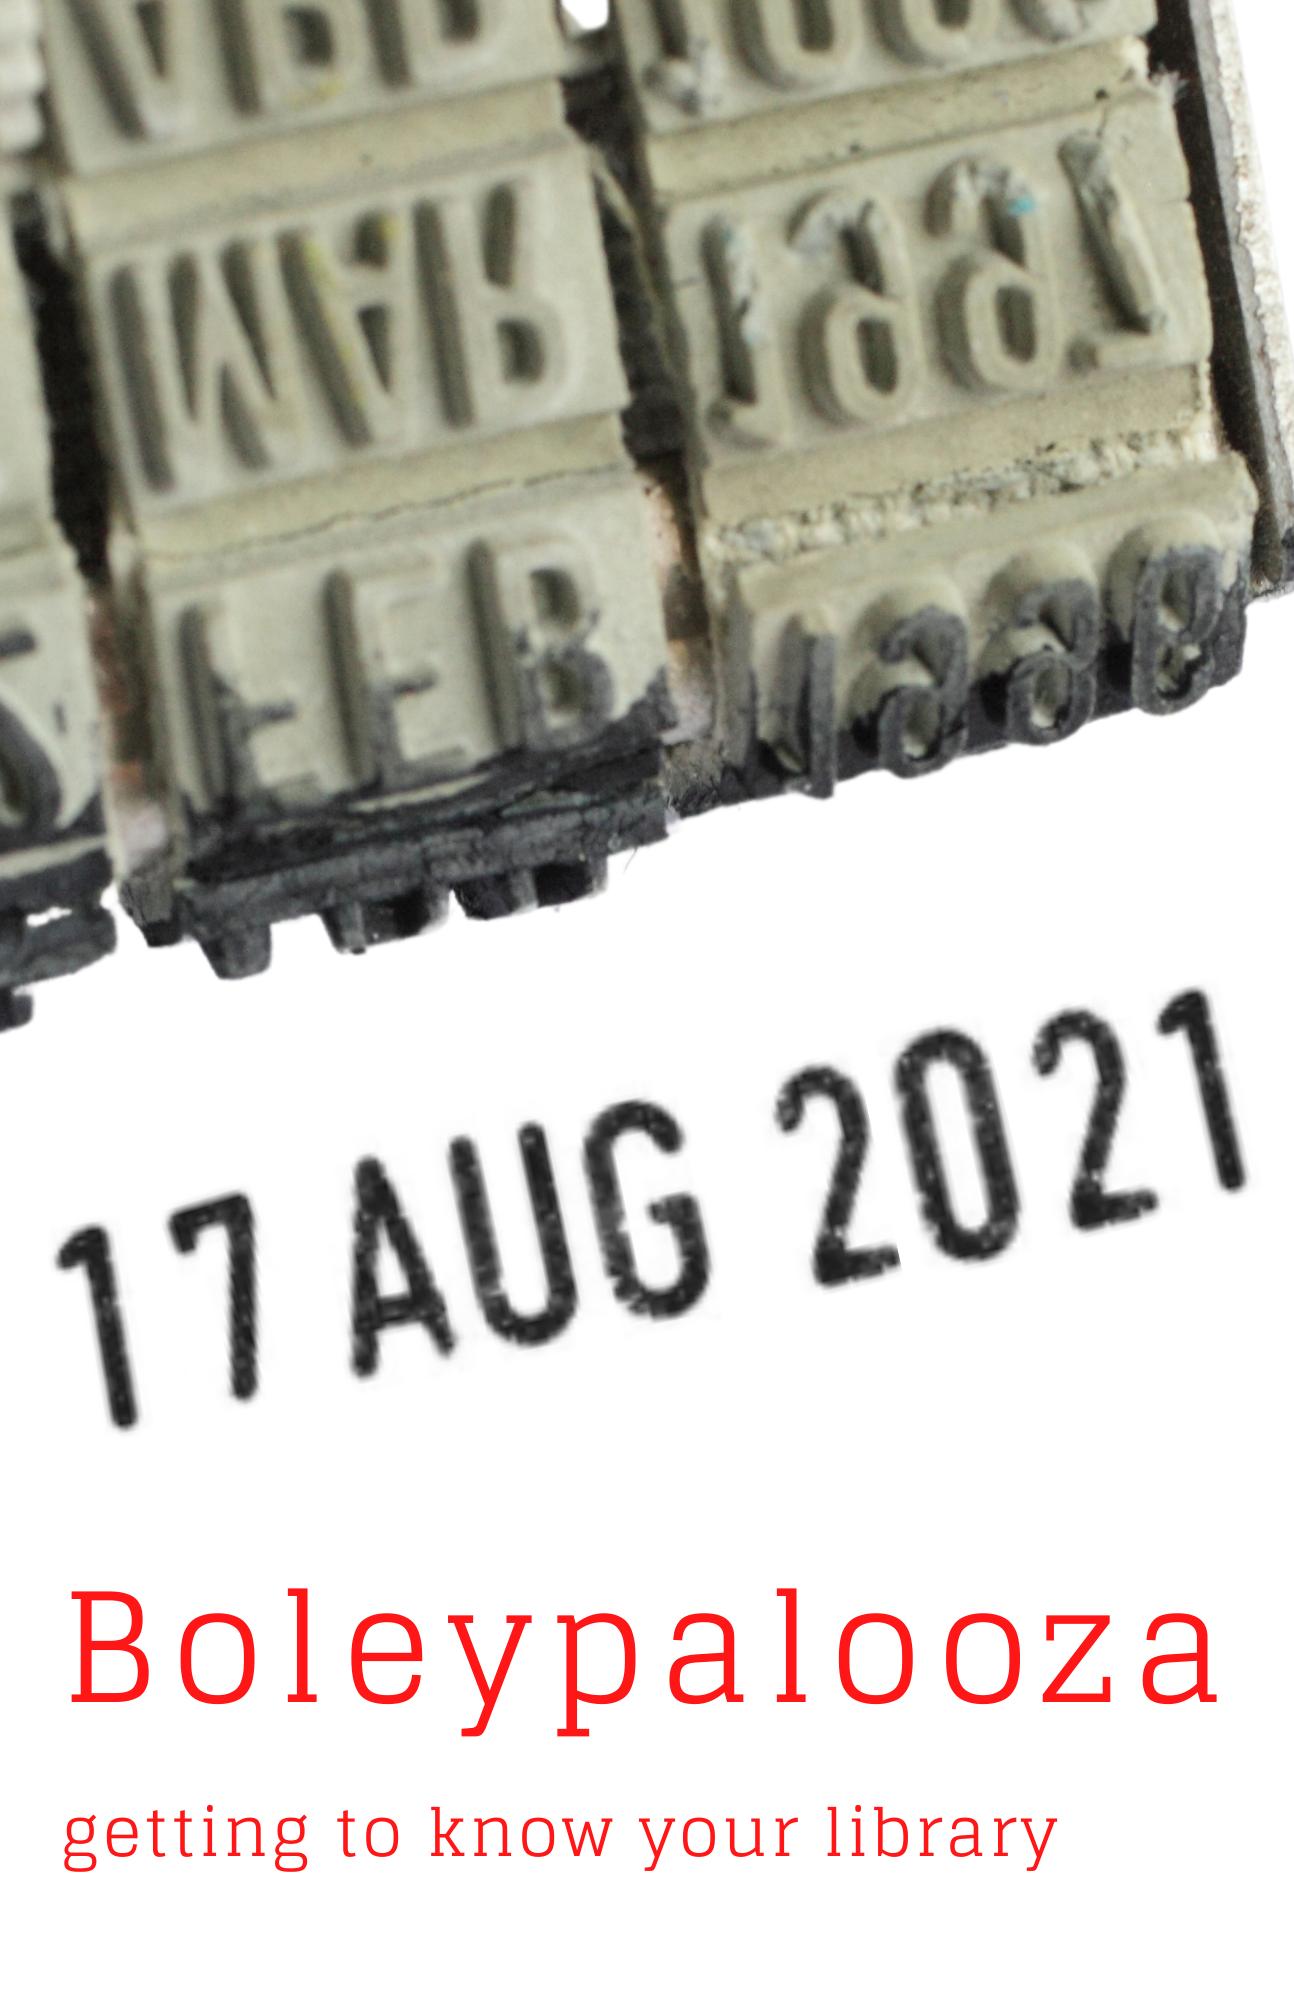 date stamp with 8/18/2021 Boleypalooza